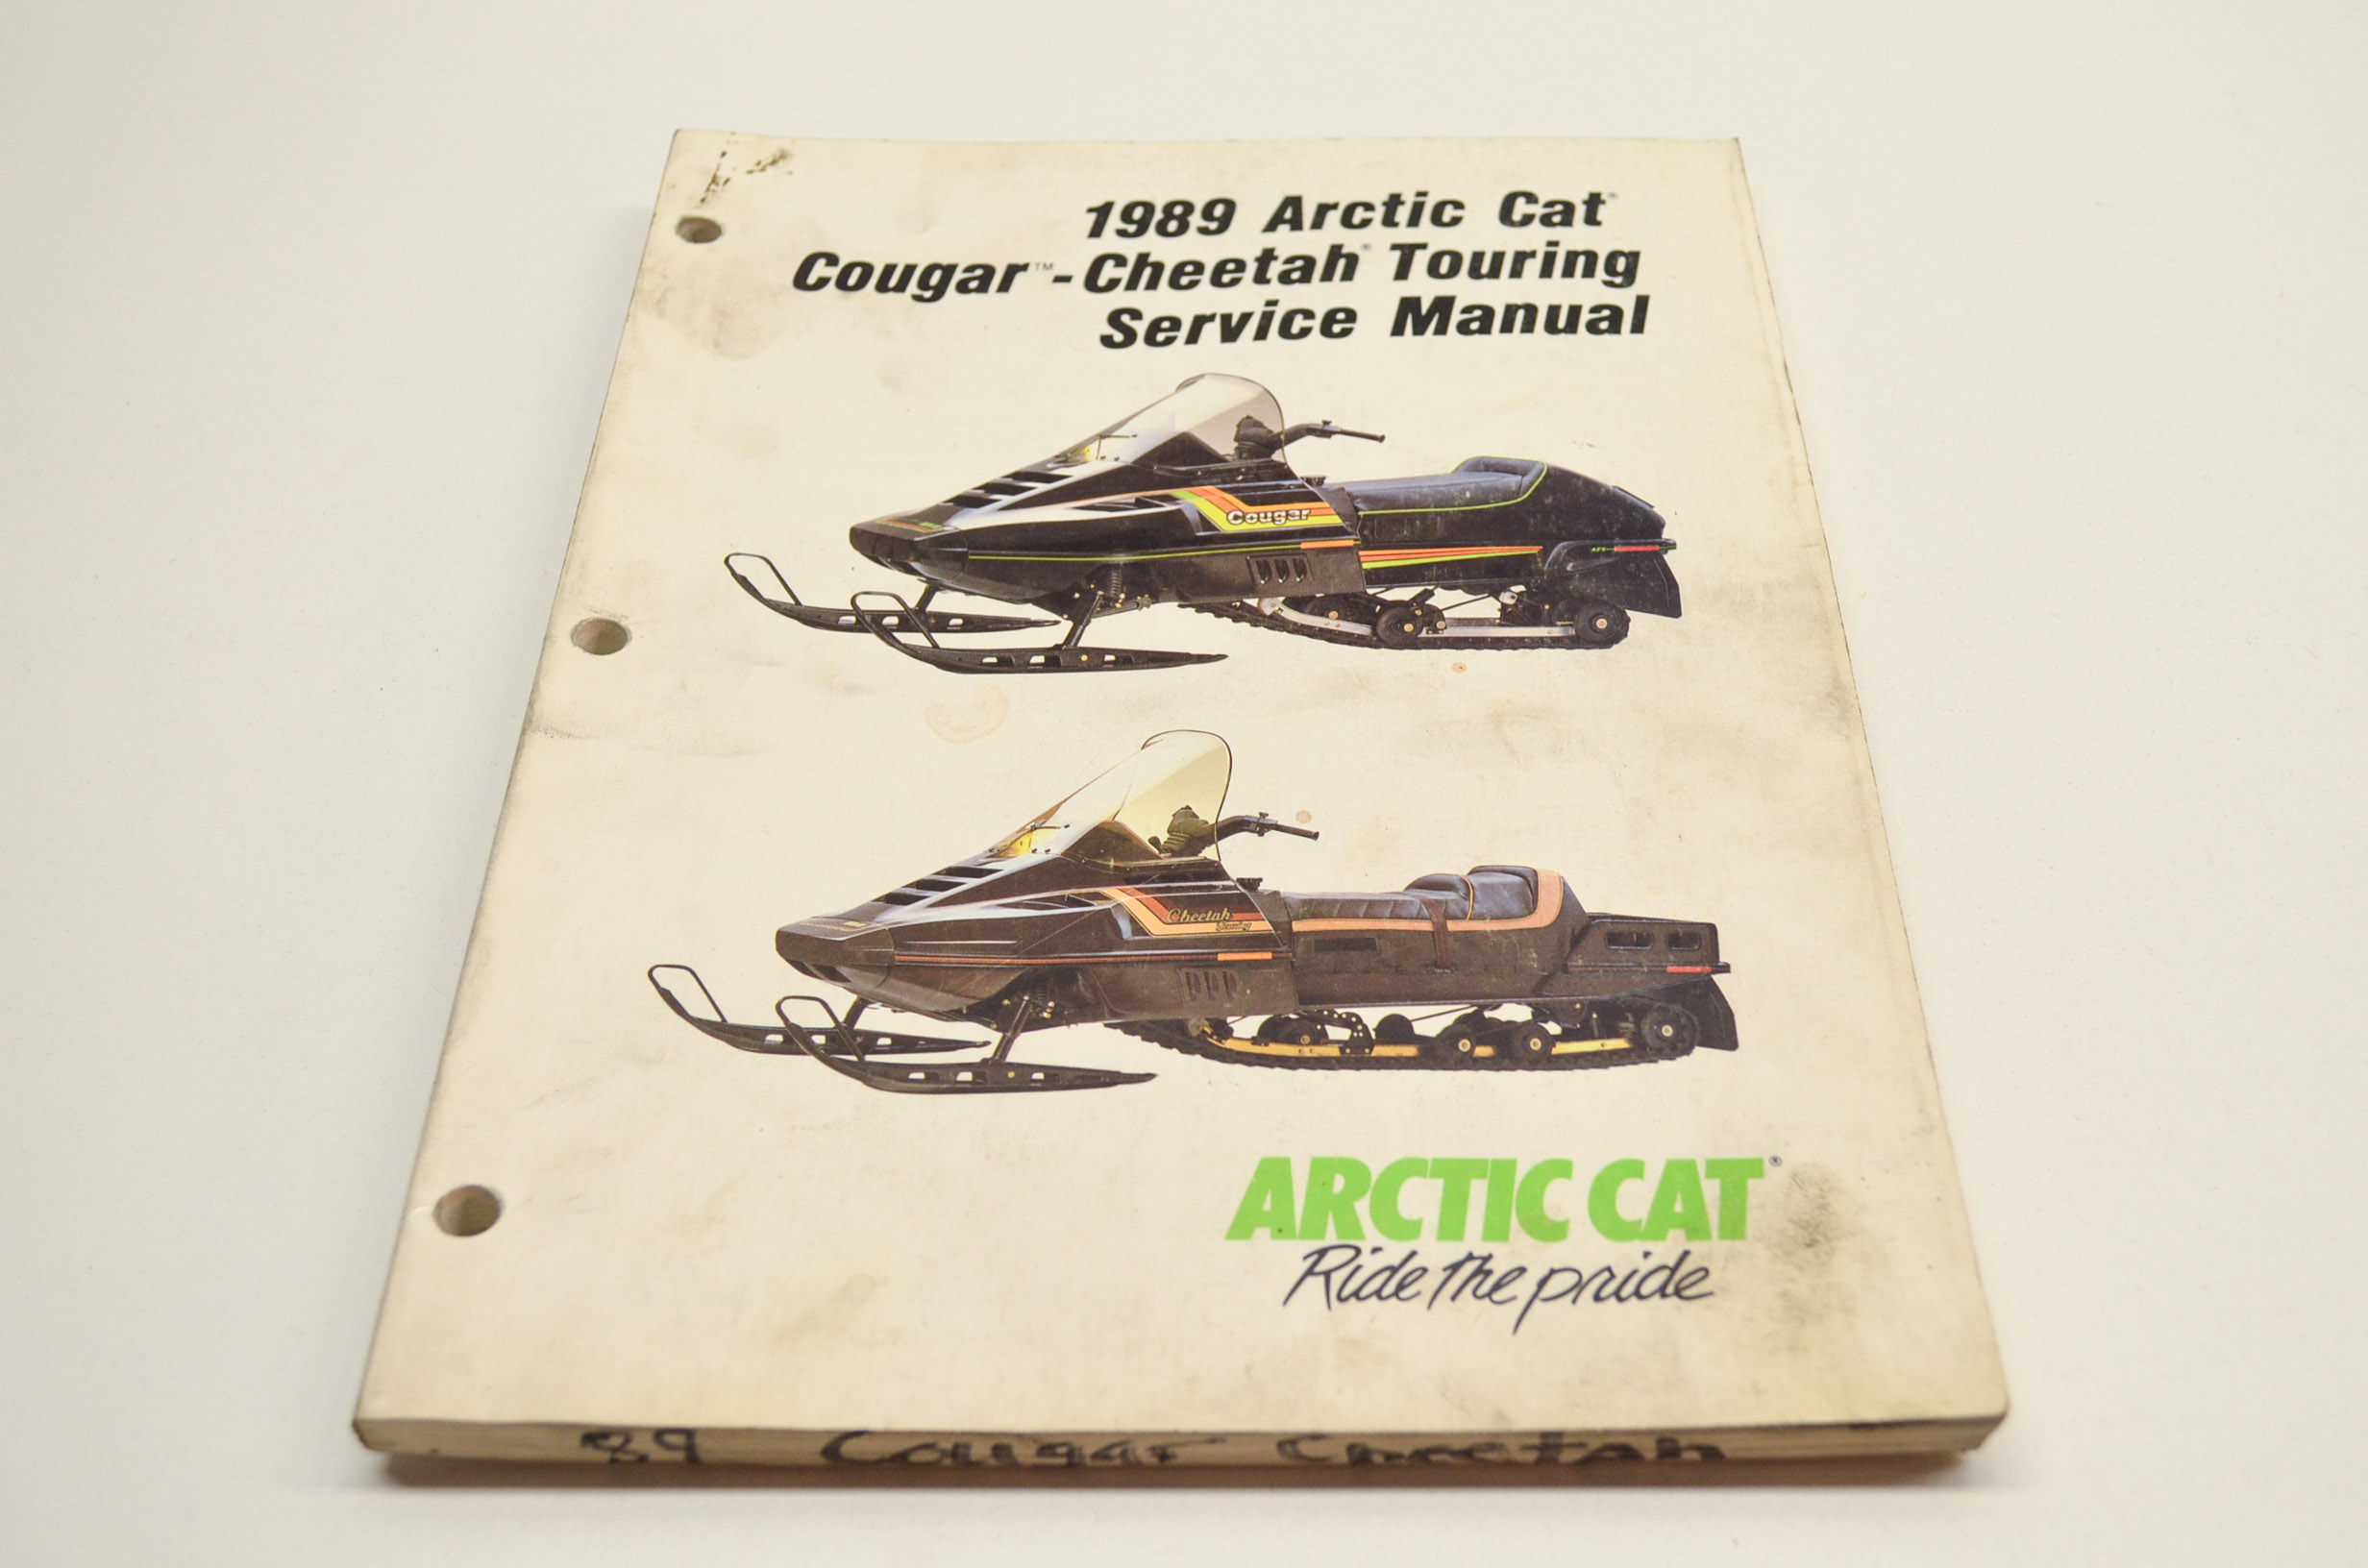 arctic cat 1989 cougar cheetah touring service manual ebay rh ebay com Arctic Cat ATV Repair Manuals 2002 Arctic Cat 300 ATV